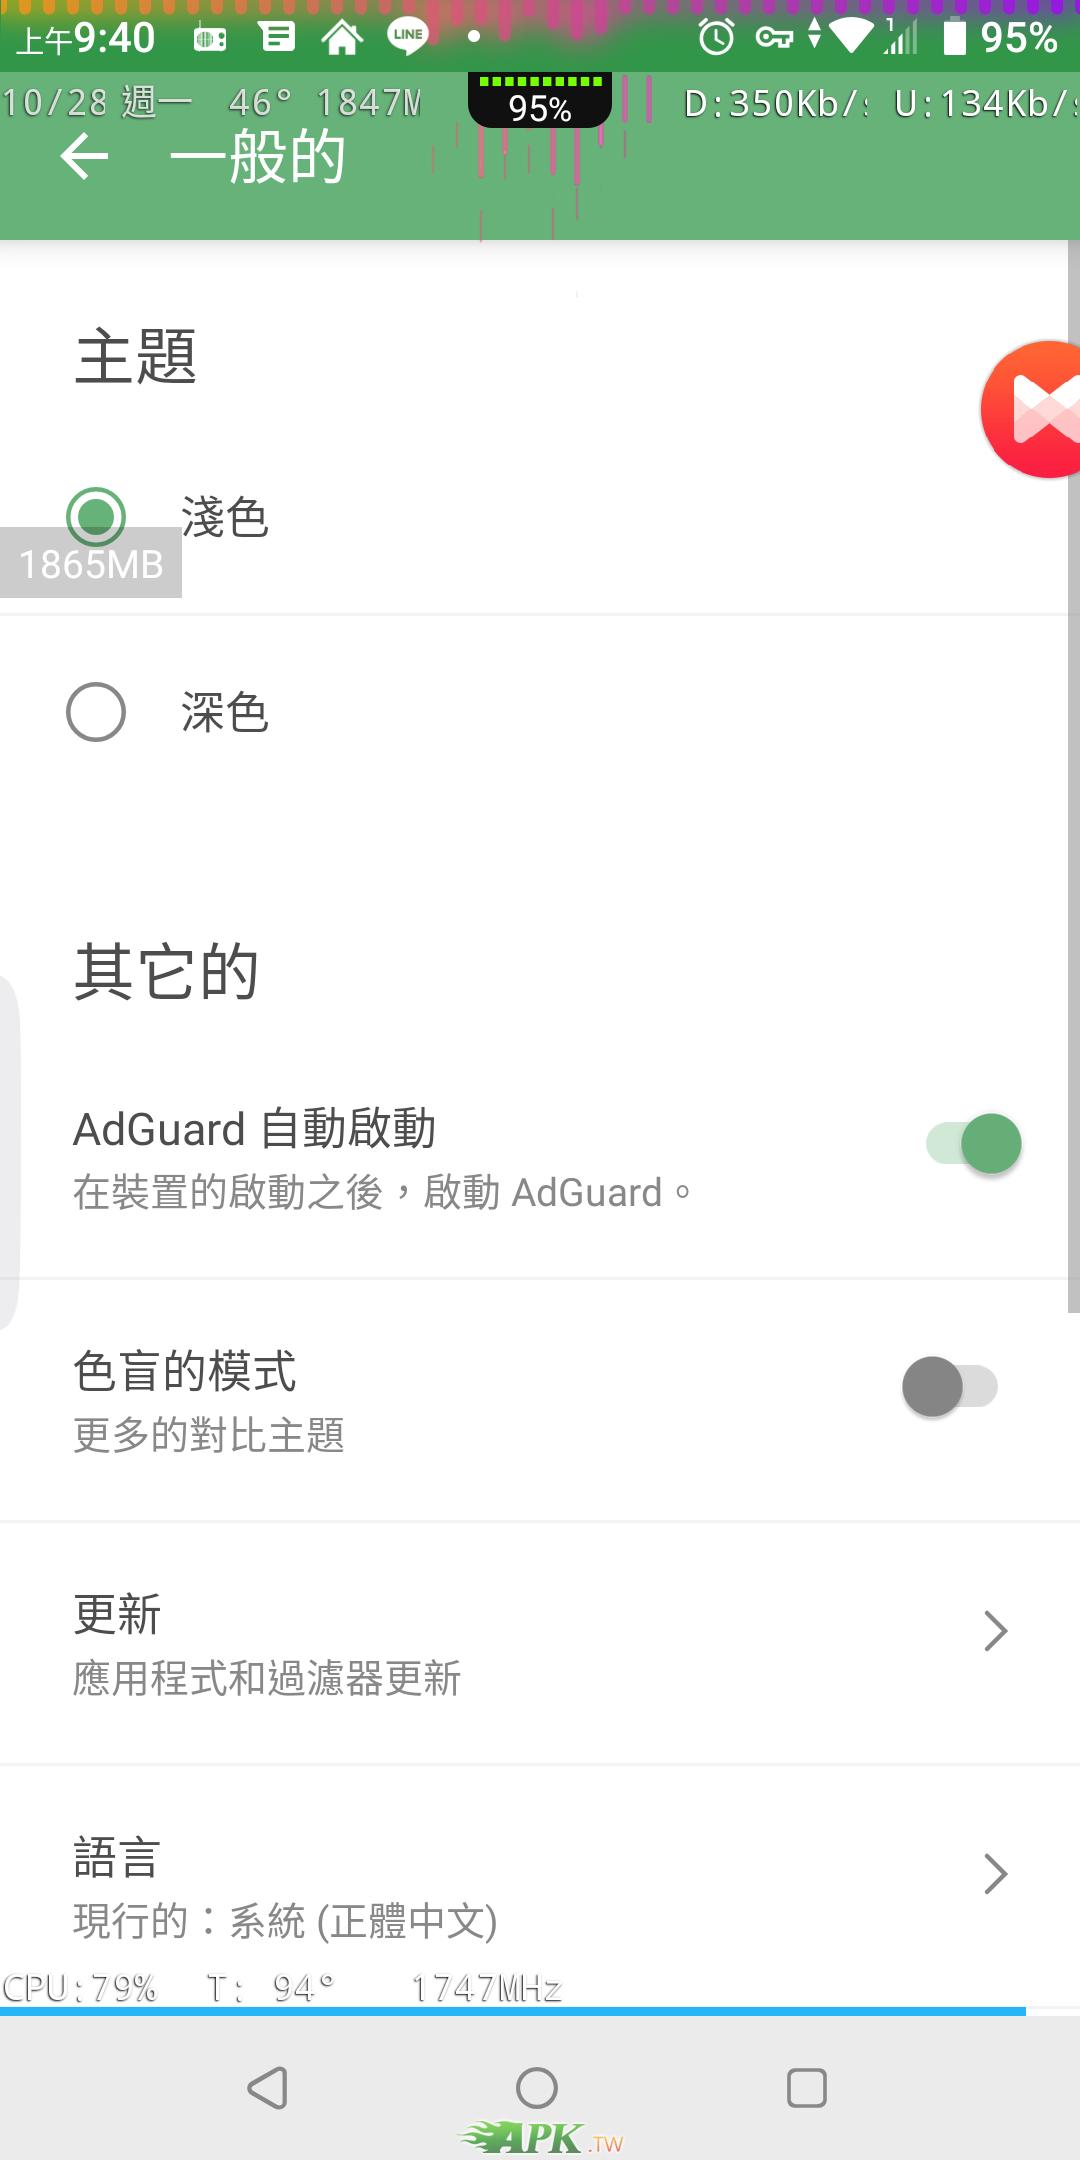 Screenshot_20191028-094045.png